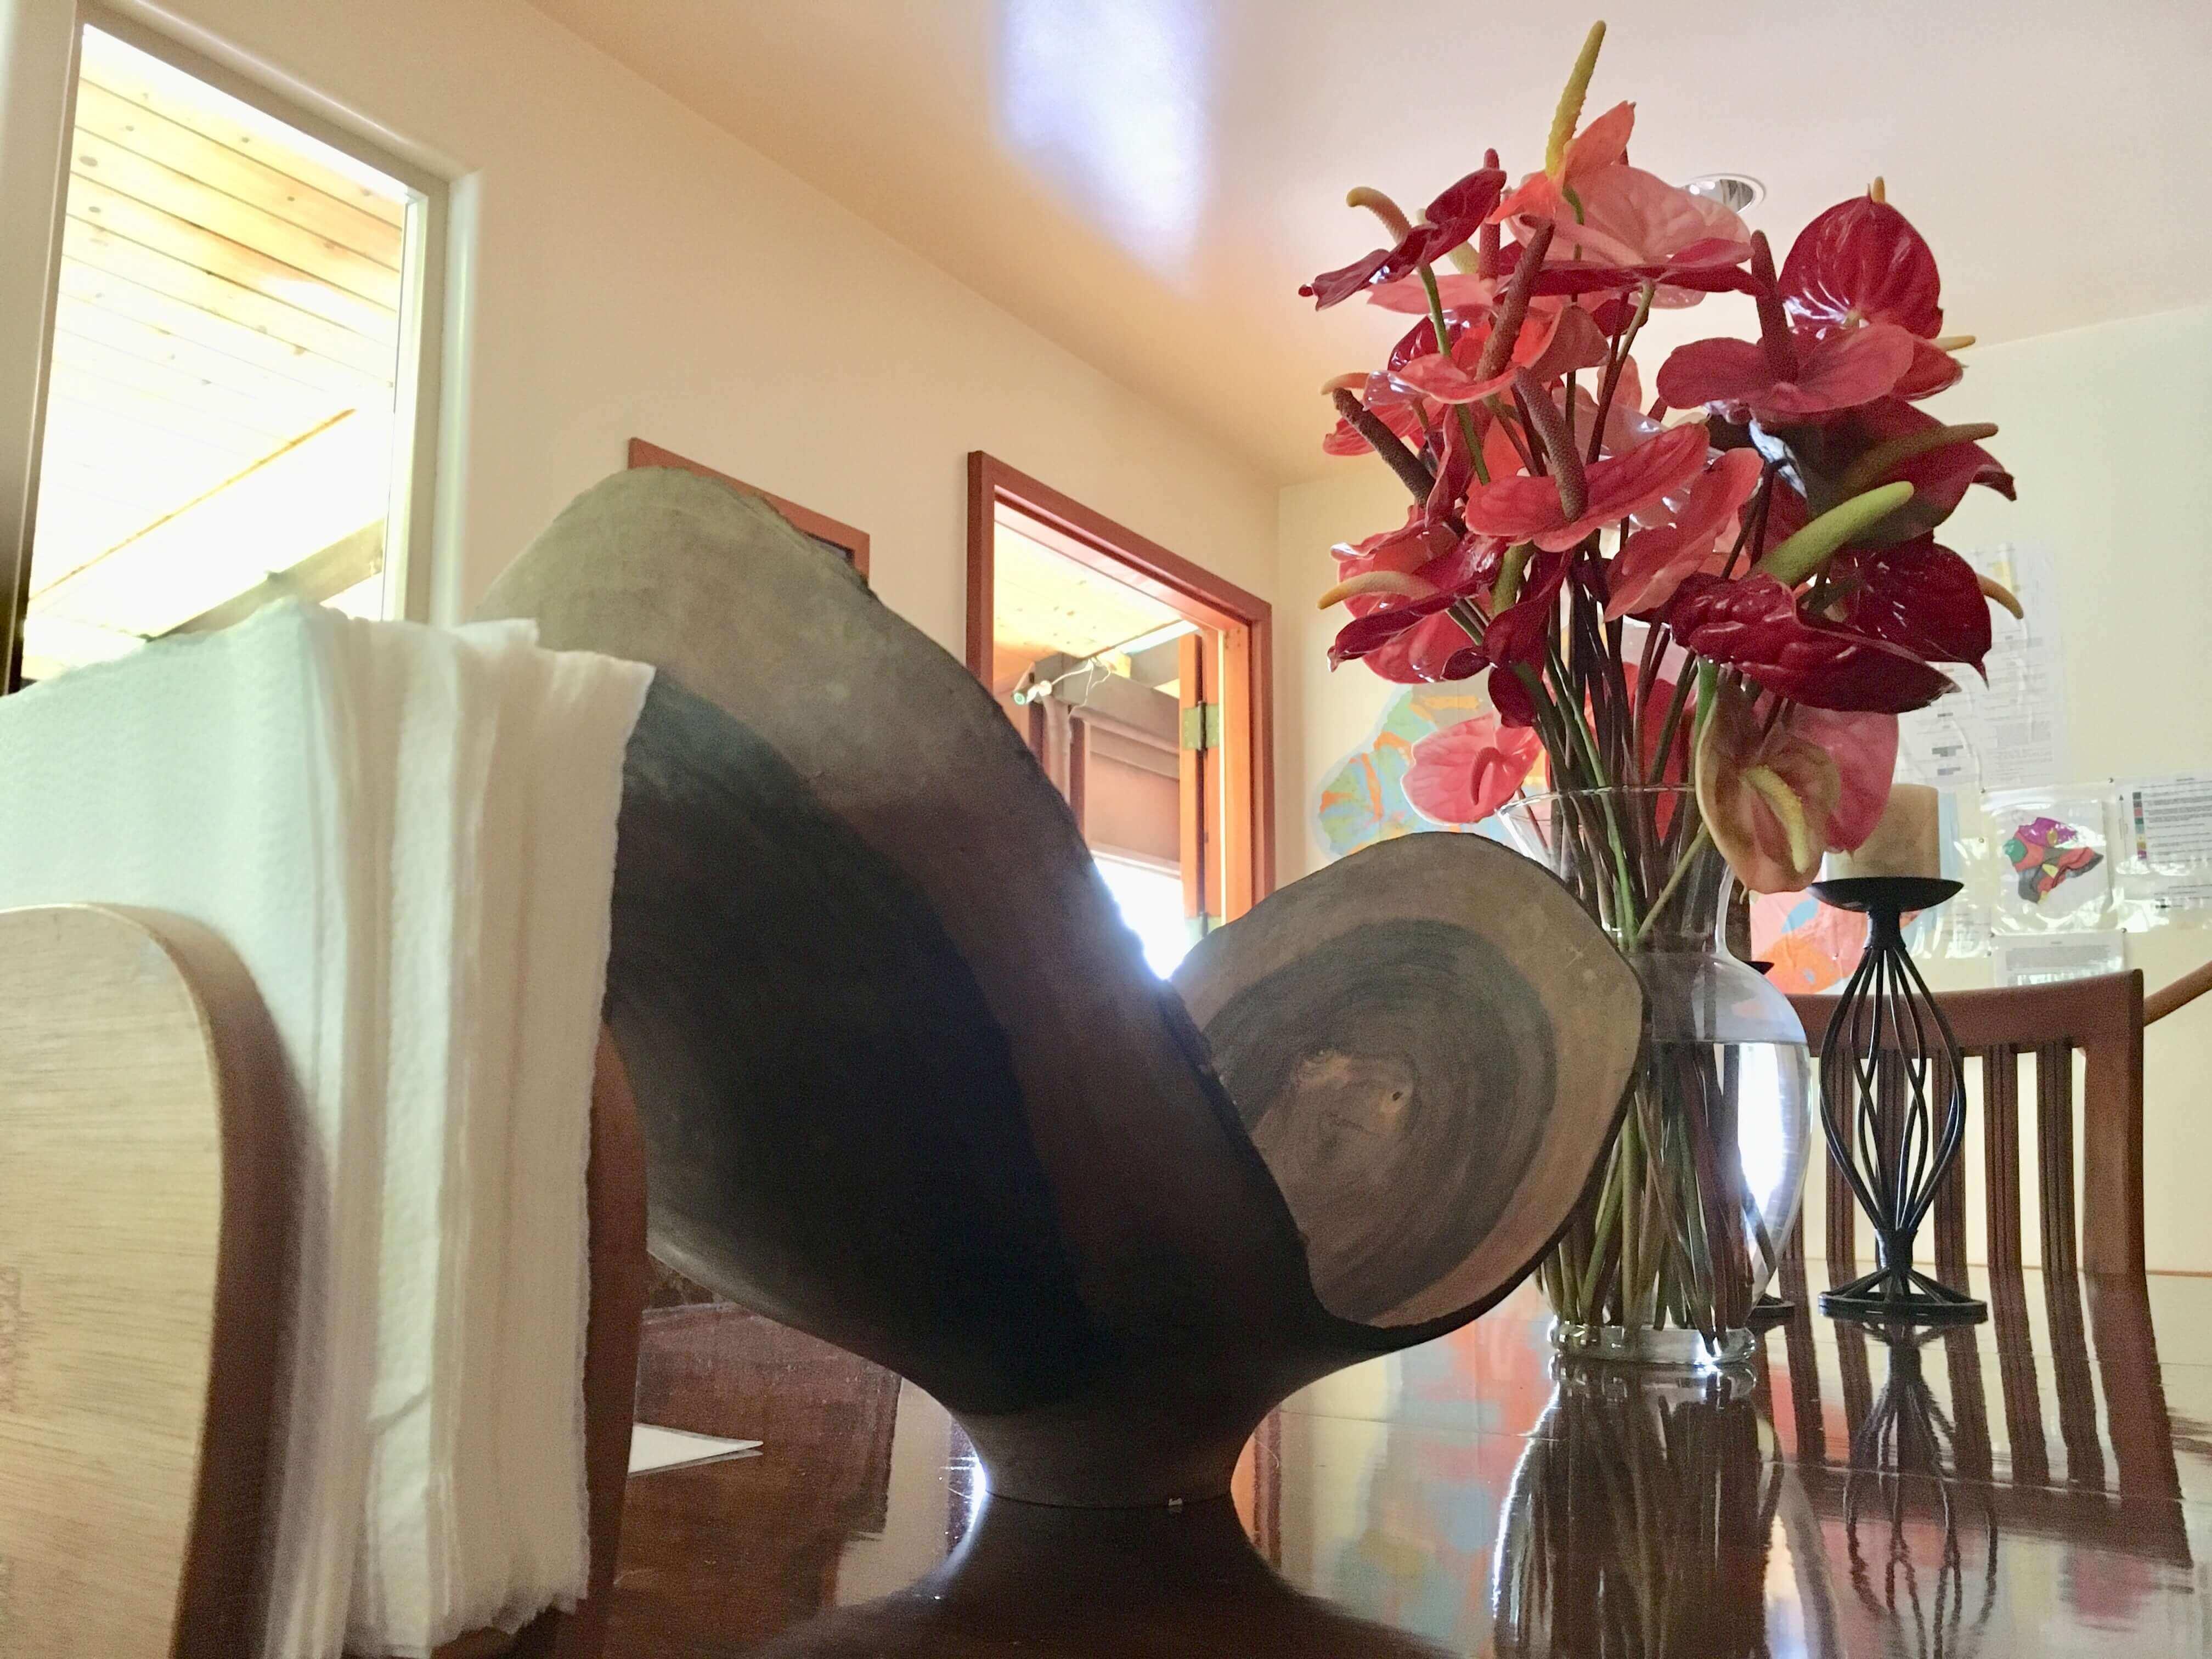 Kilauea hotel-volcano inn-common room flower